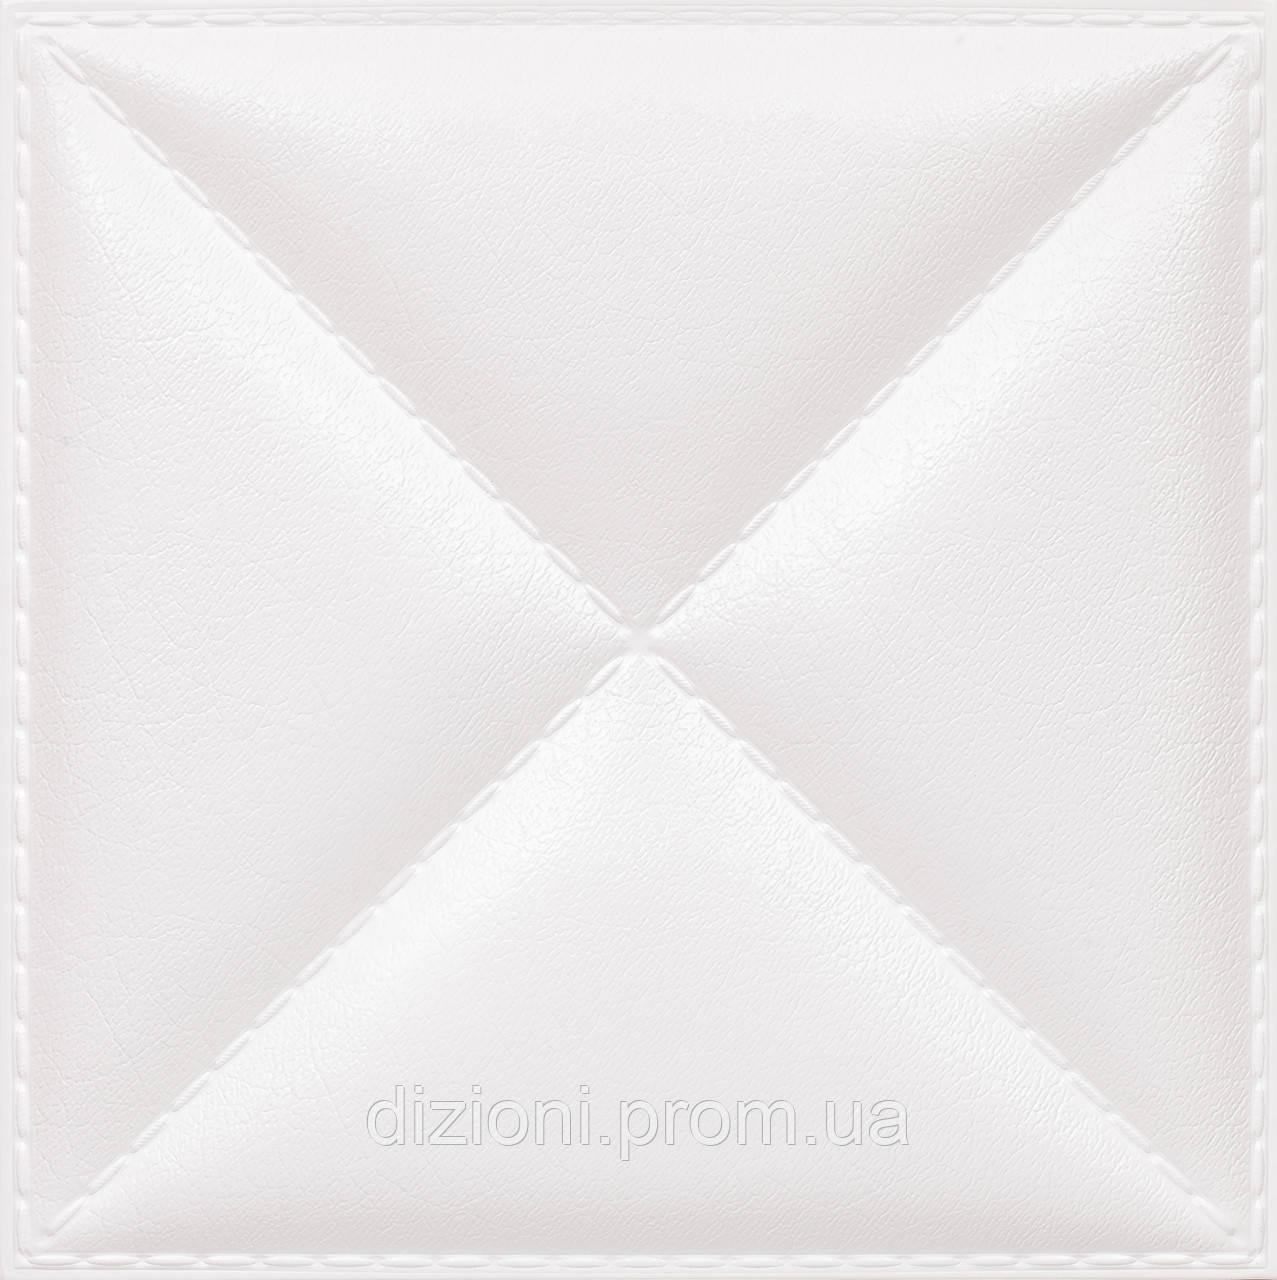 Dizioni Decor №2023 белый